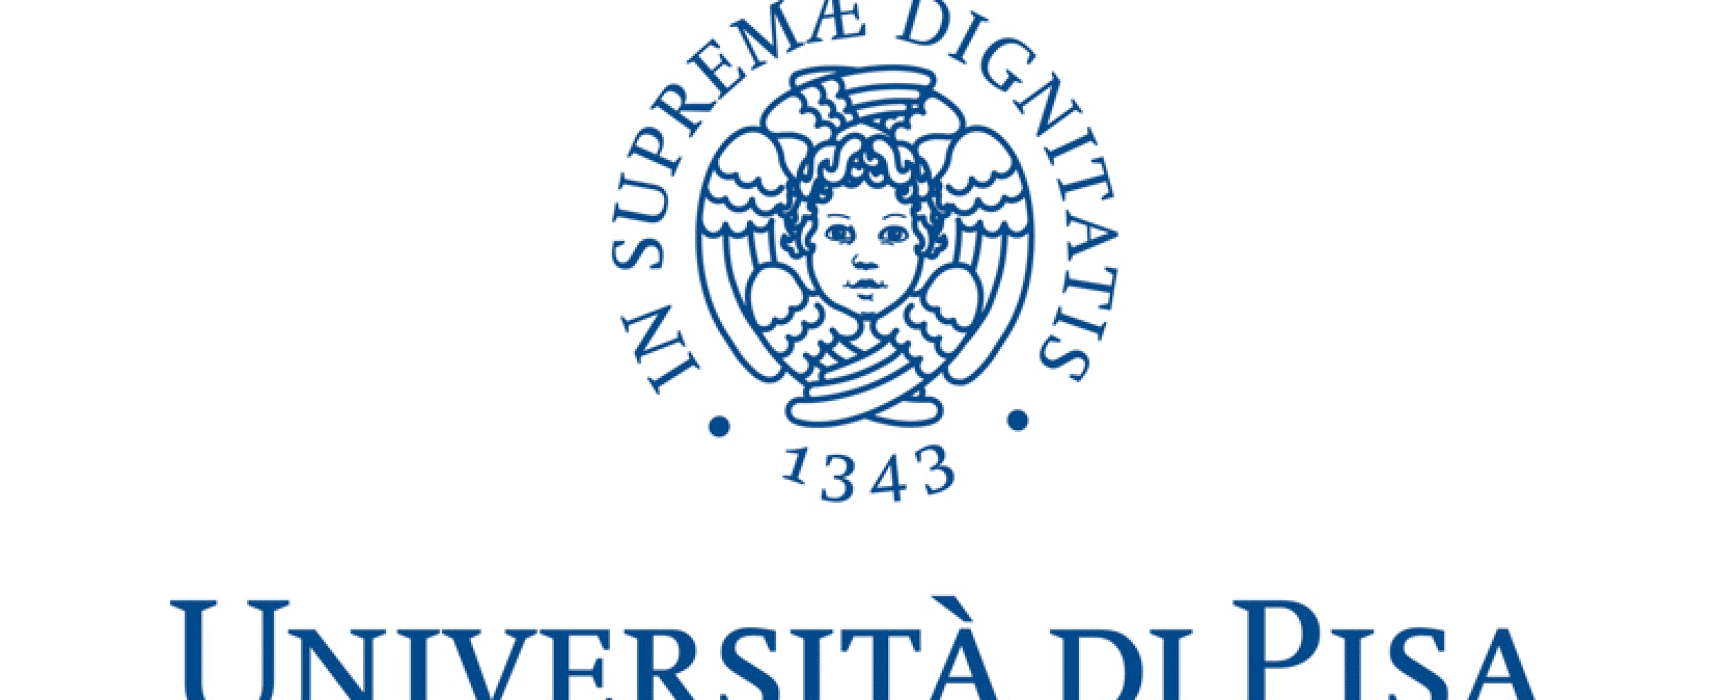 Calendario Unipi.Unipi Universita Degli Studi Di Pisa Informazioni Utili